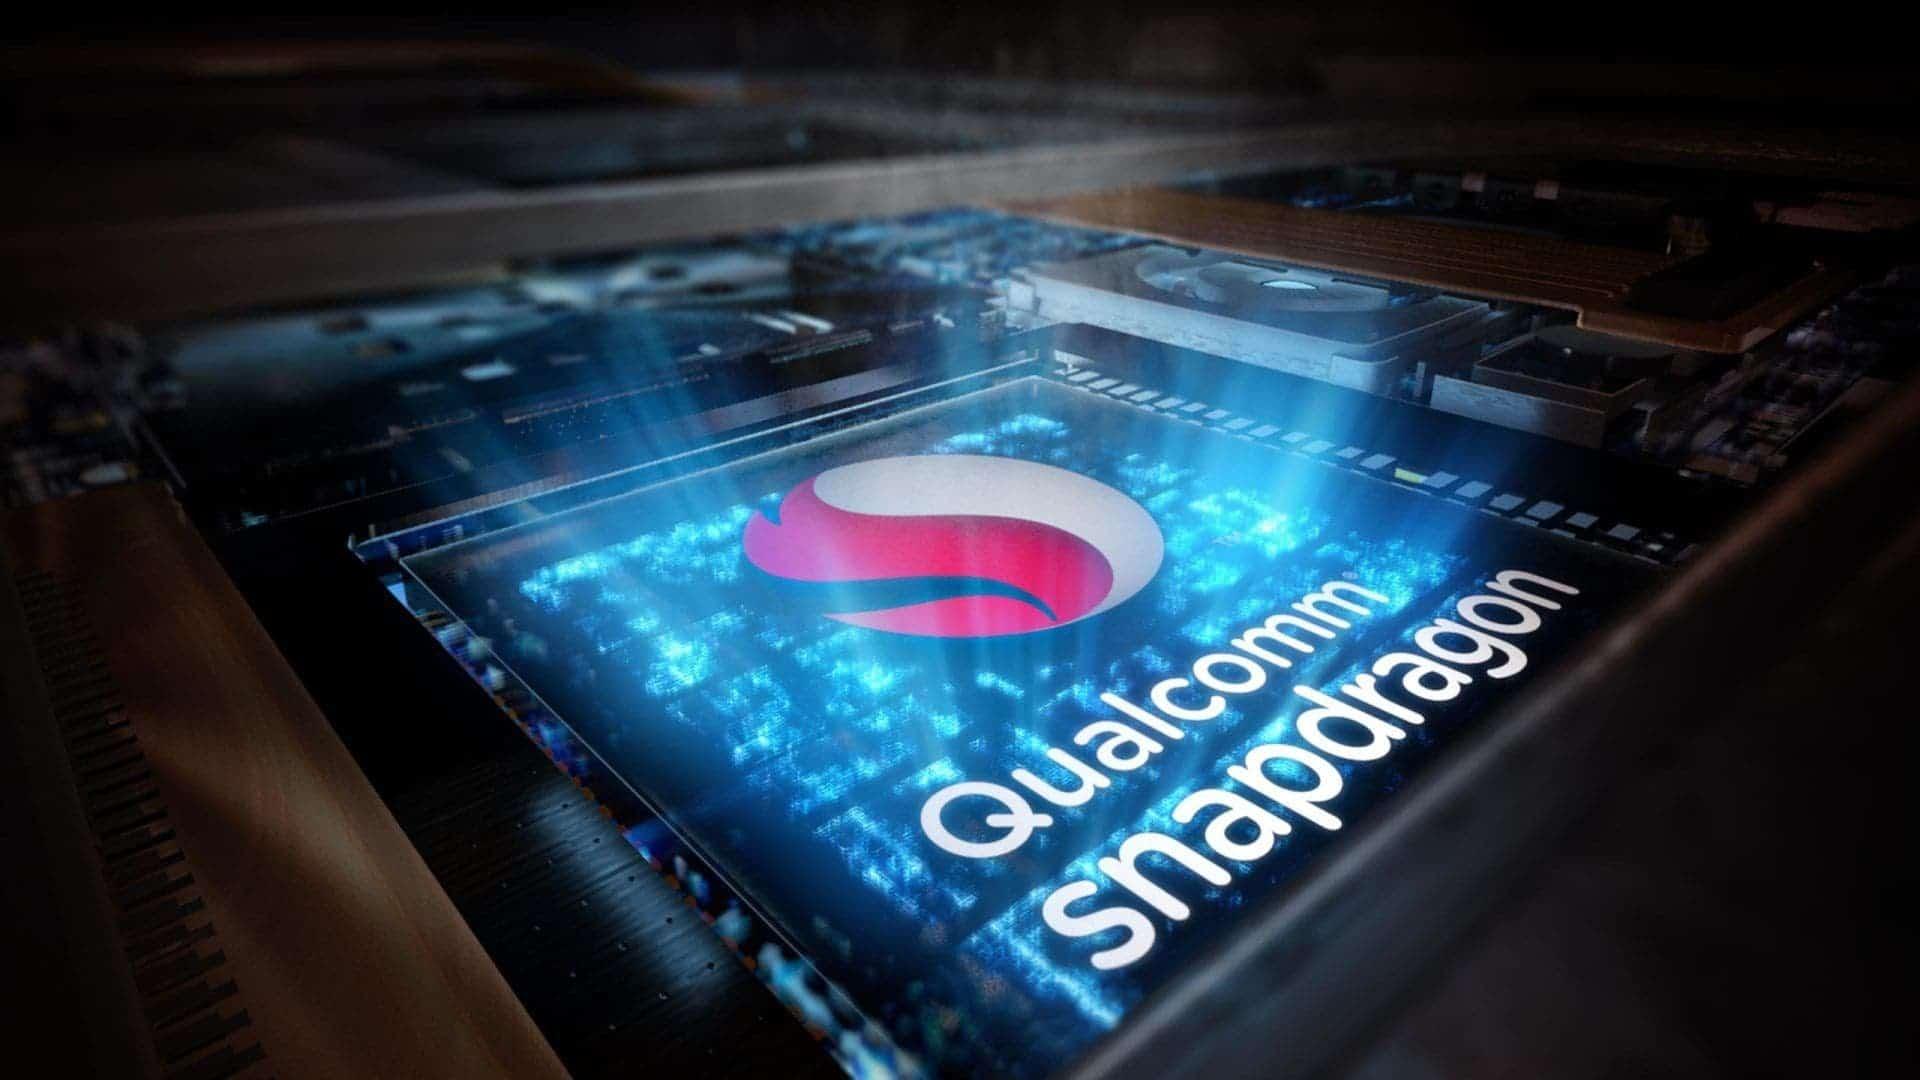 Snapdragon SoC, snapdragon 730G